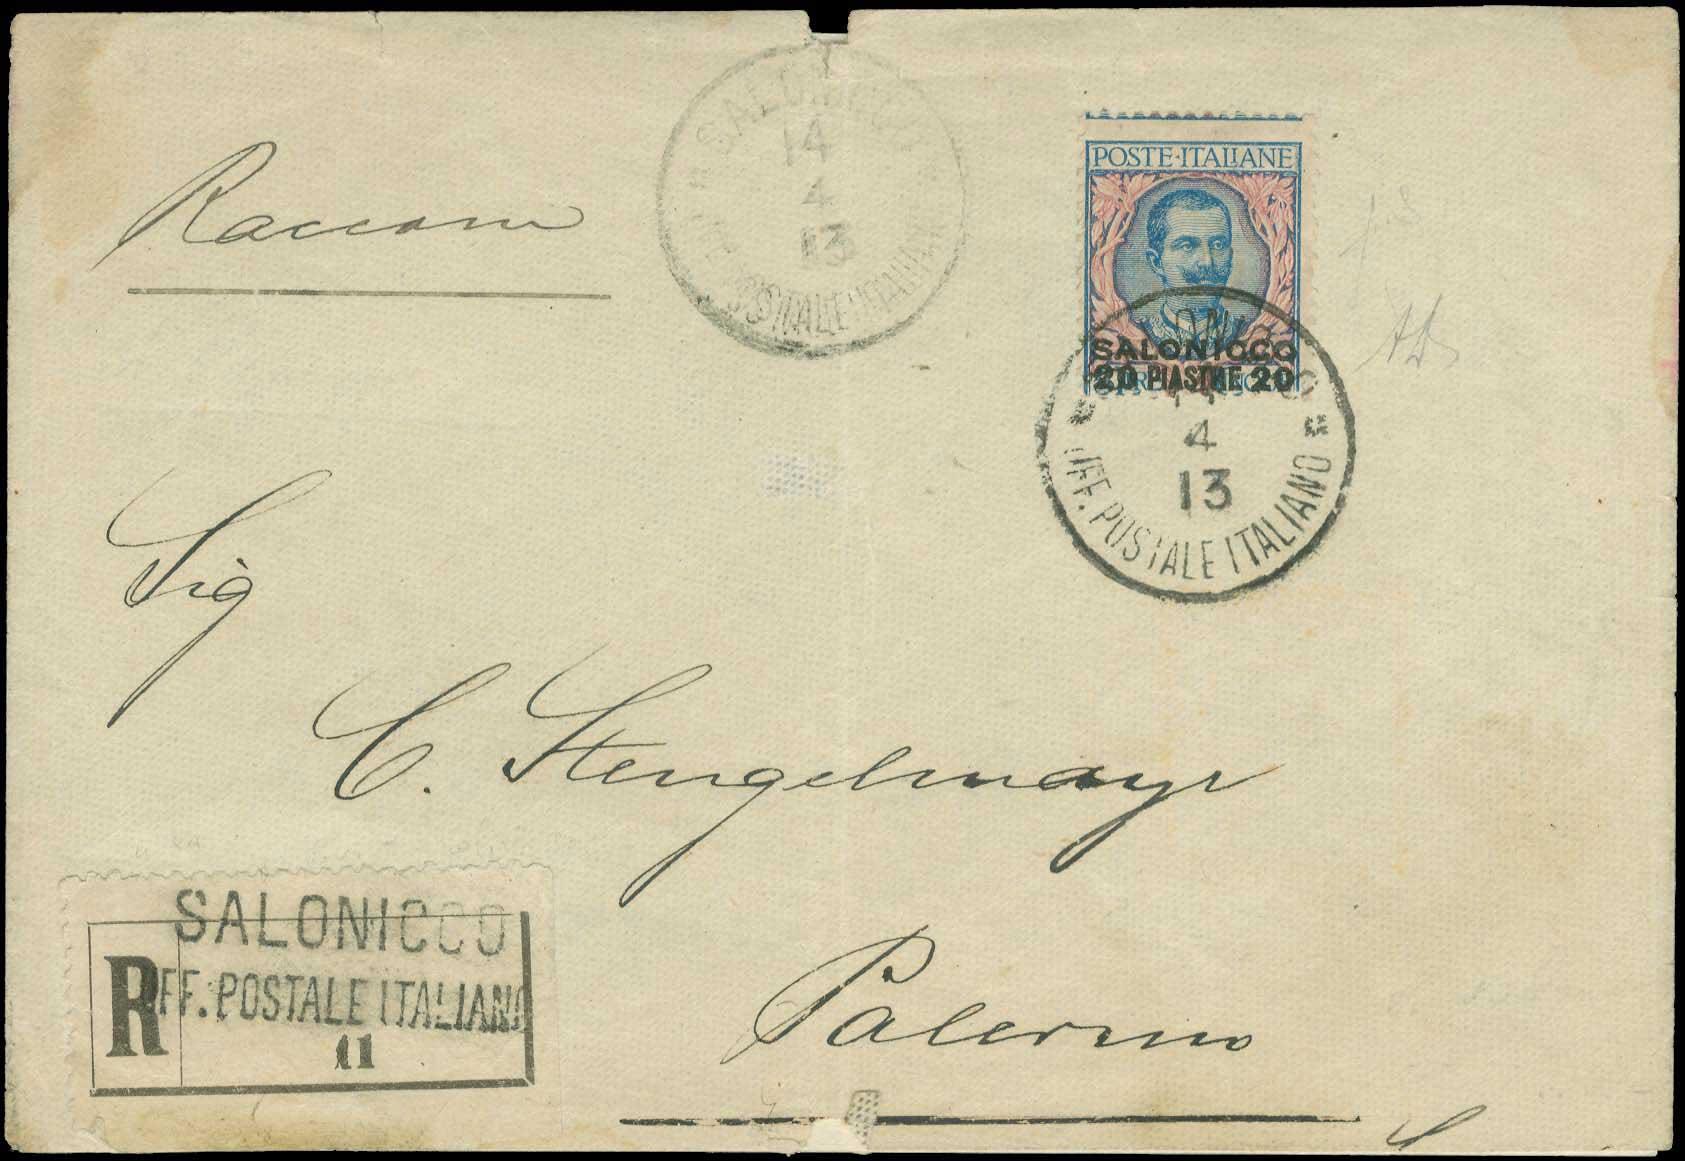 Lot 856 - -  THESSALONIKI (SALONICA) Thessaloniki (Salonica) -  A. Karamitsos Public Auction 639 General Stamp Sale